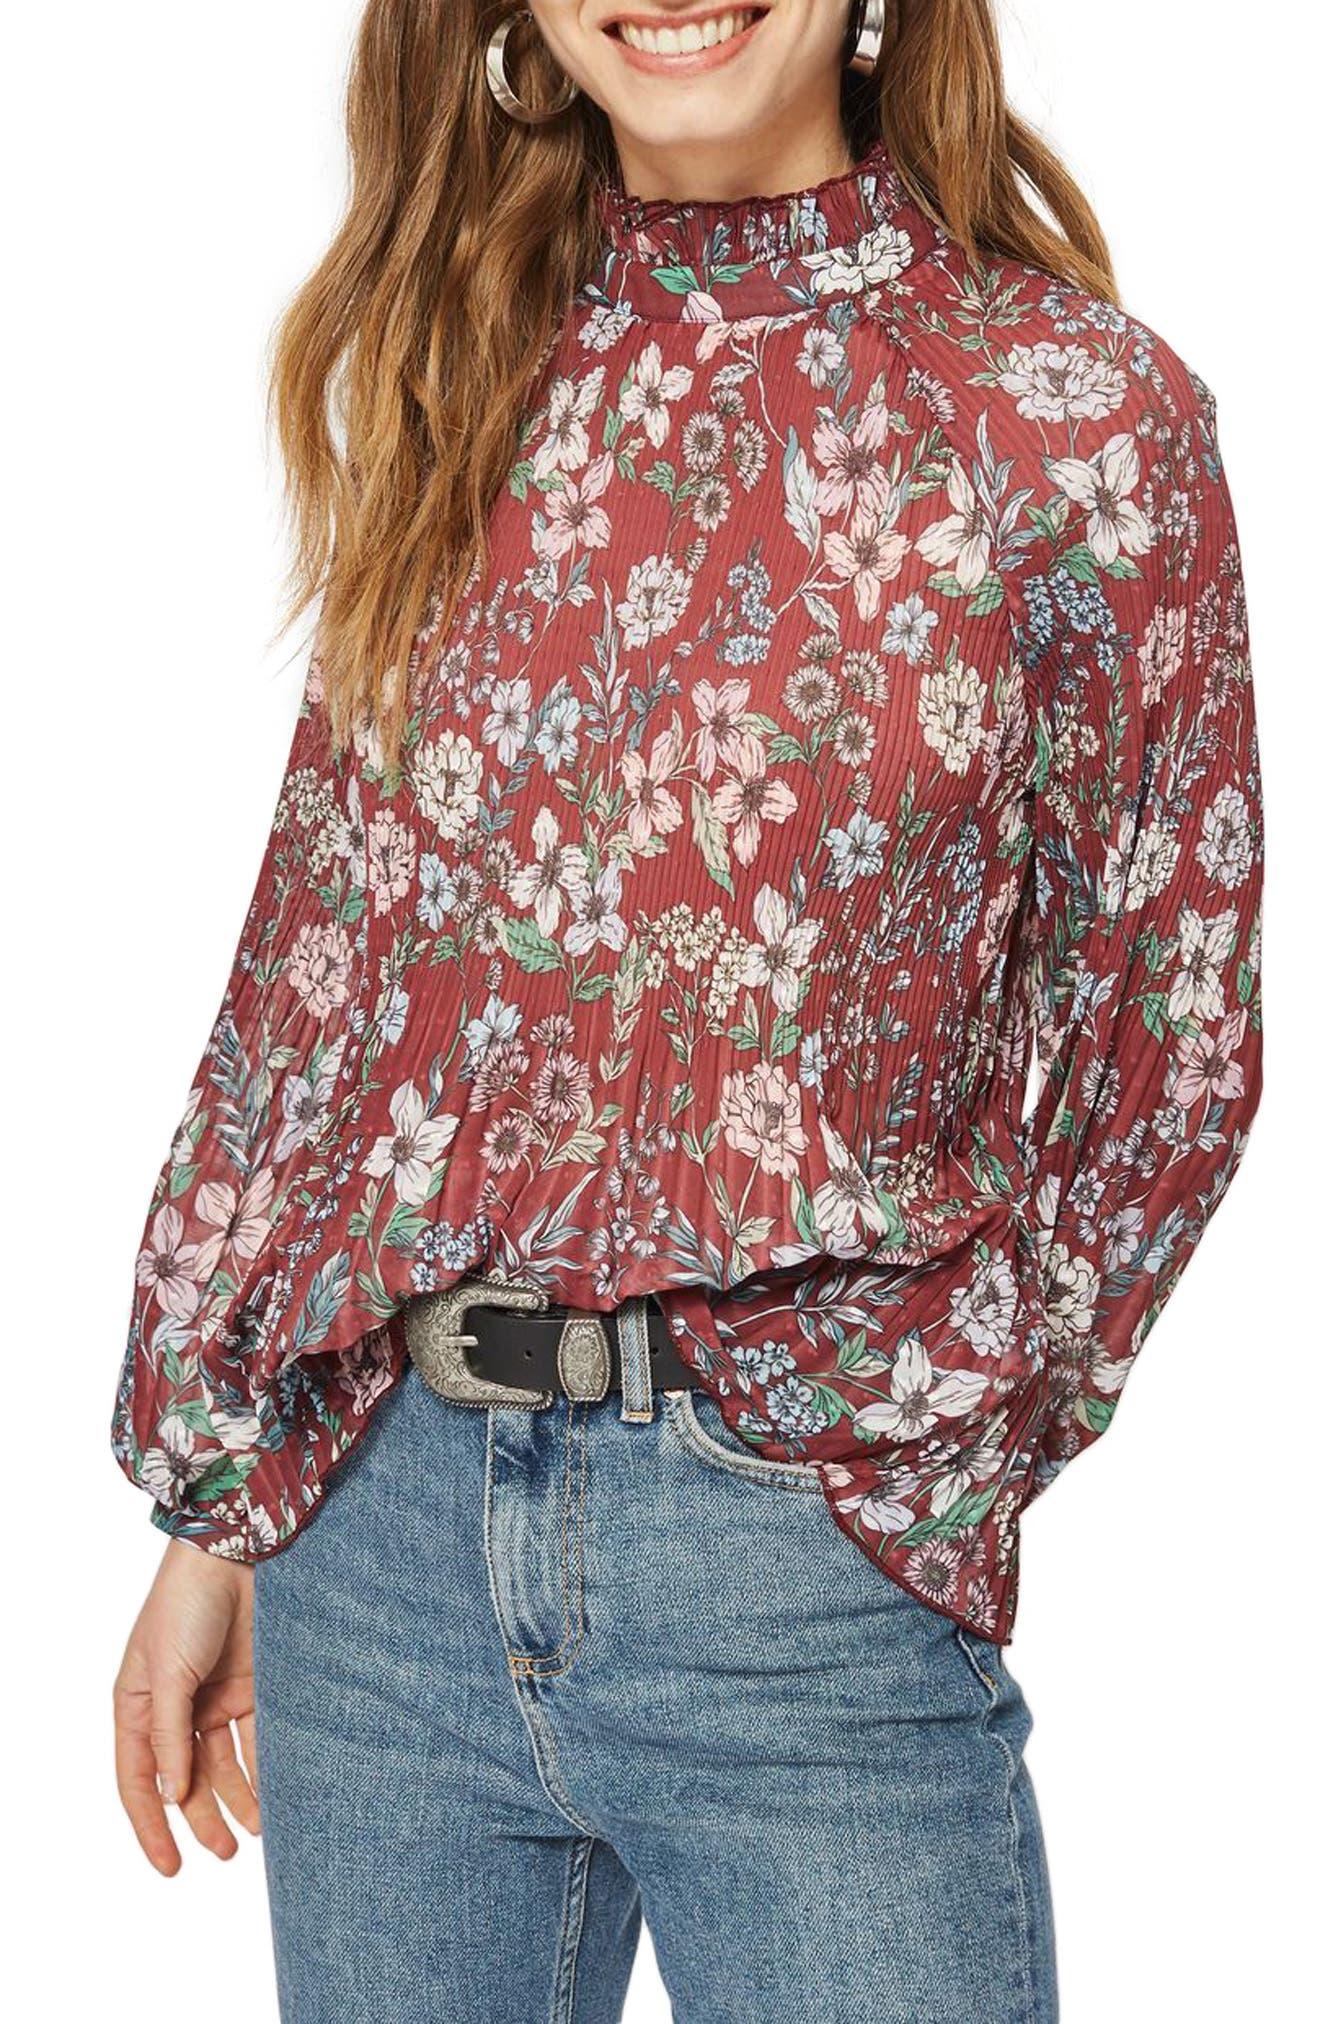 Main Image - Topshop Floral Pleat Tunic Blouse